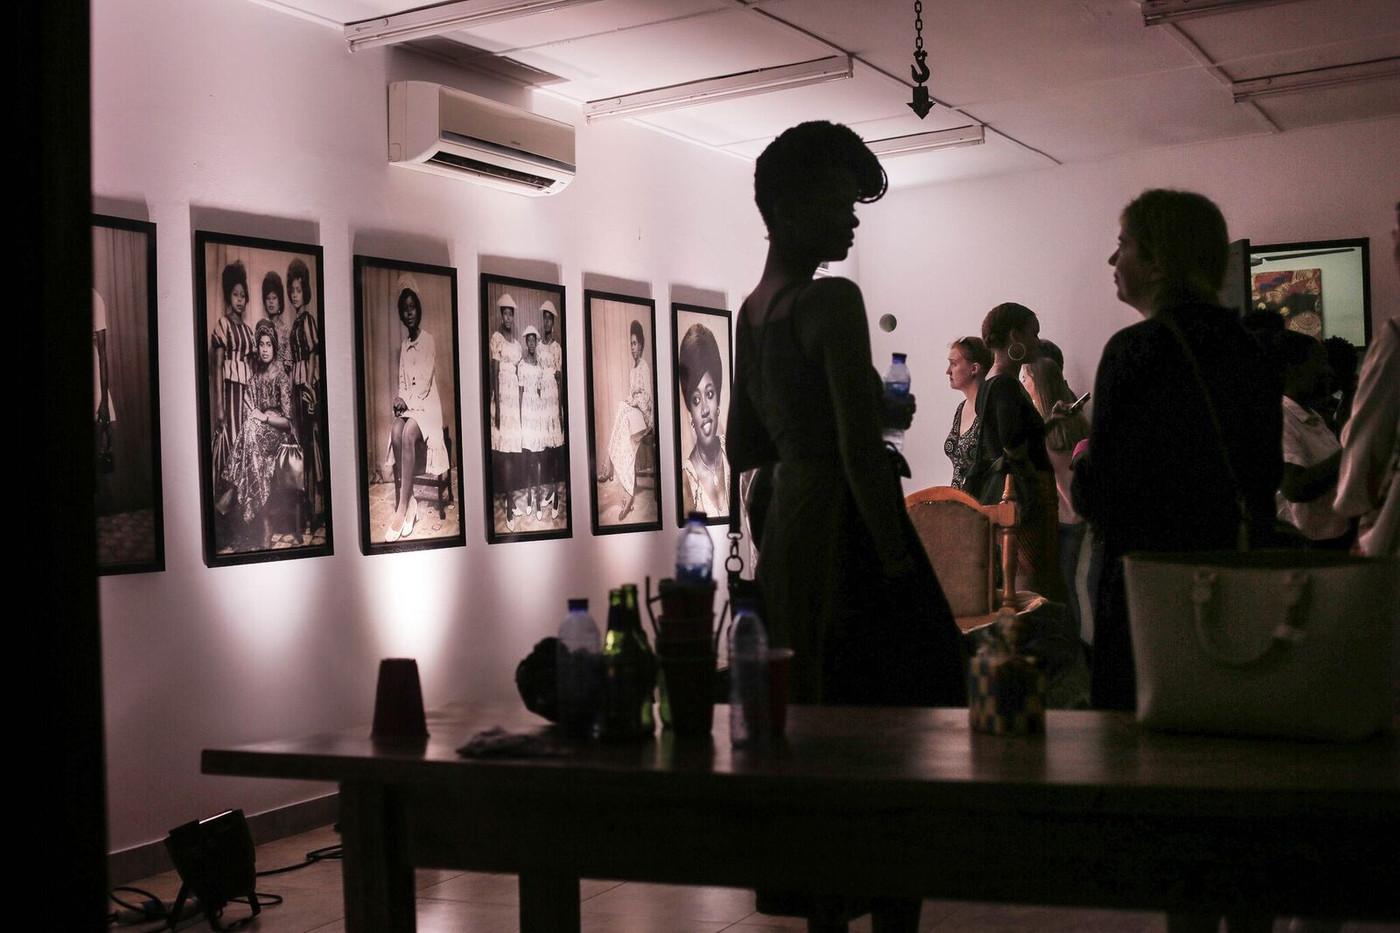 Accra: Portraits of a City